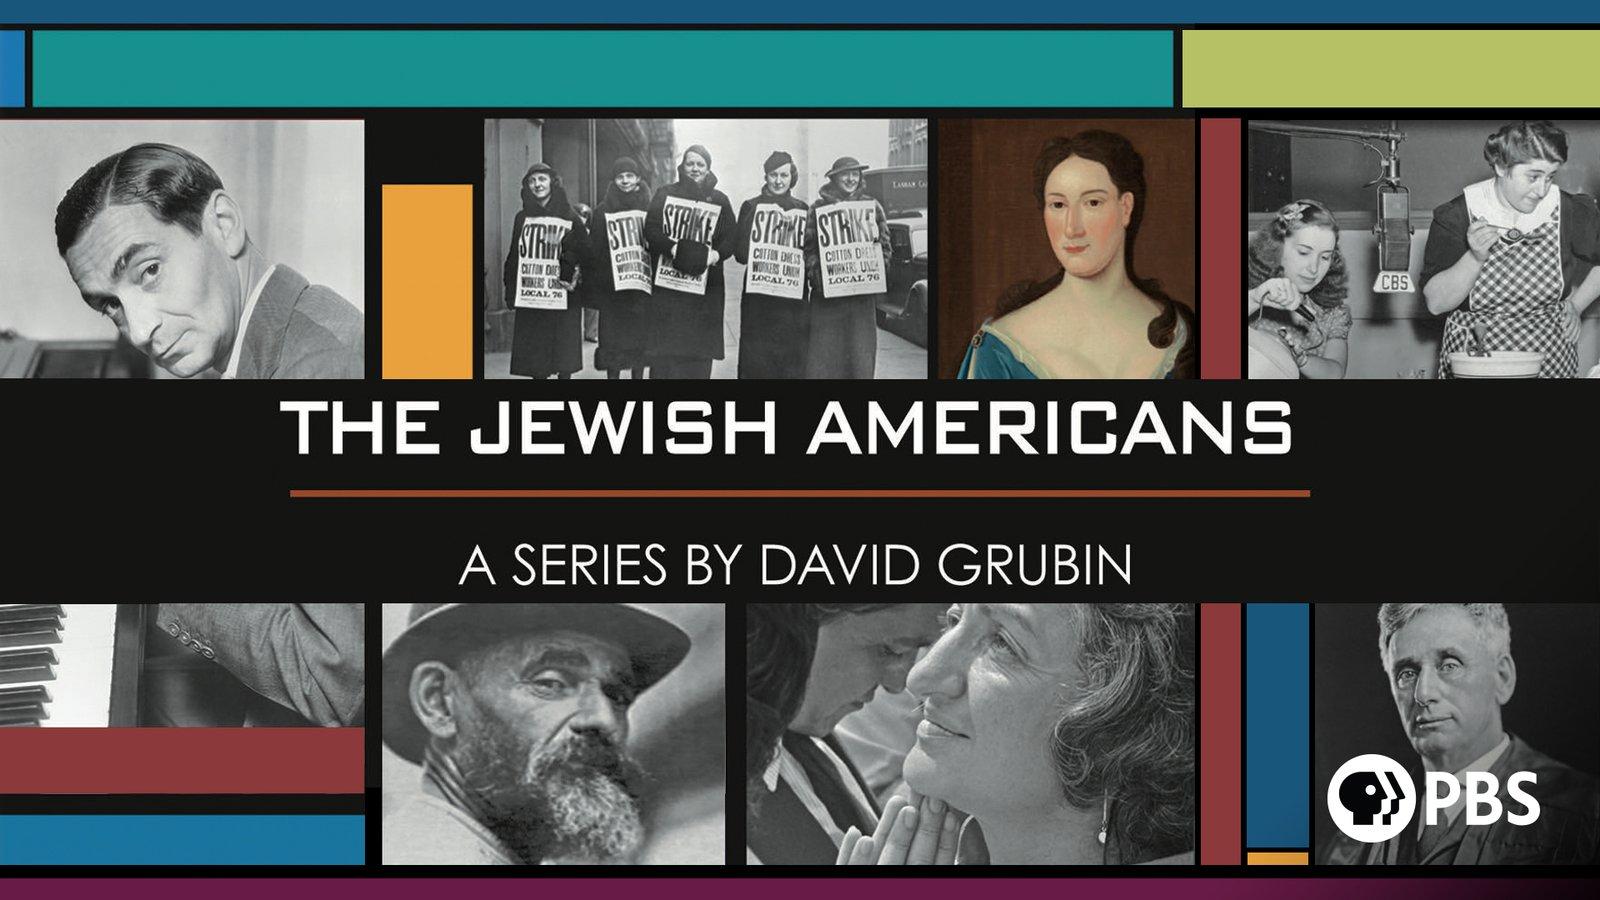 The Jewish Americans - A Series by David Grubin